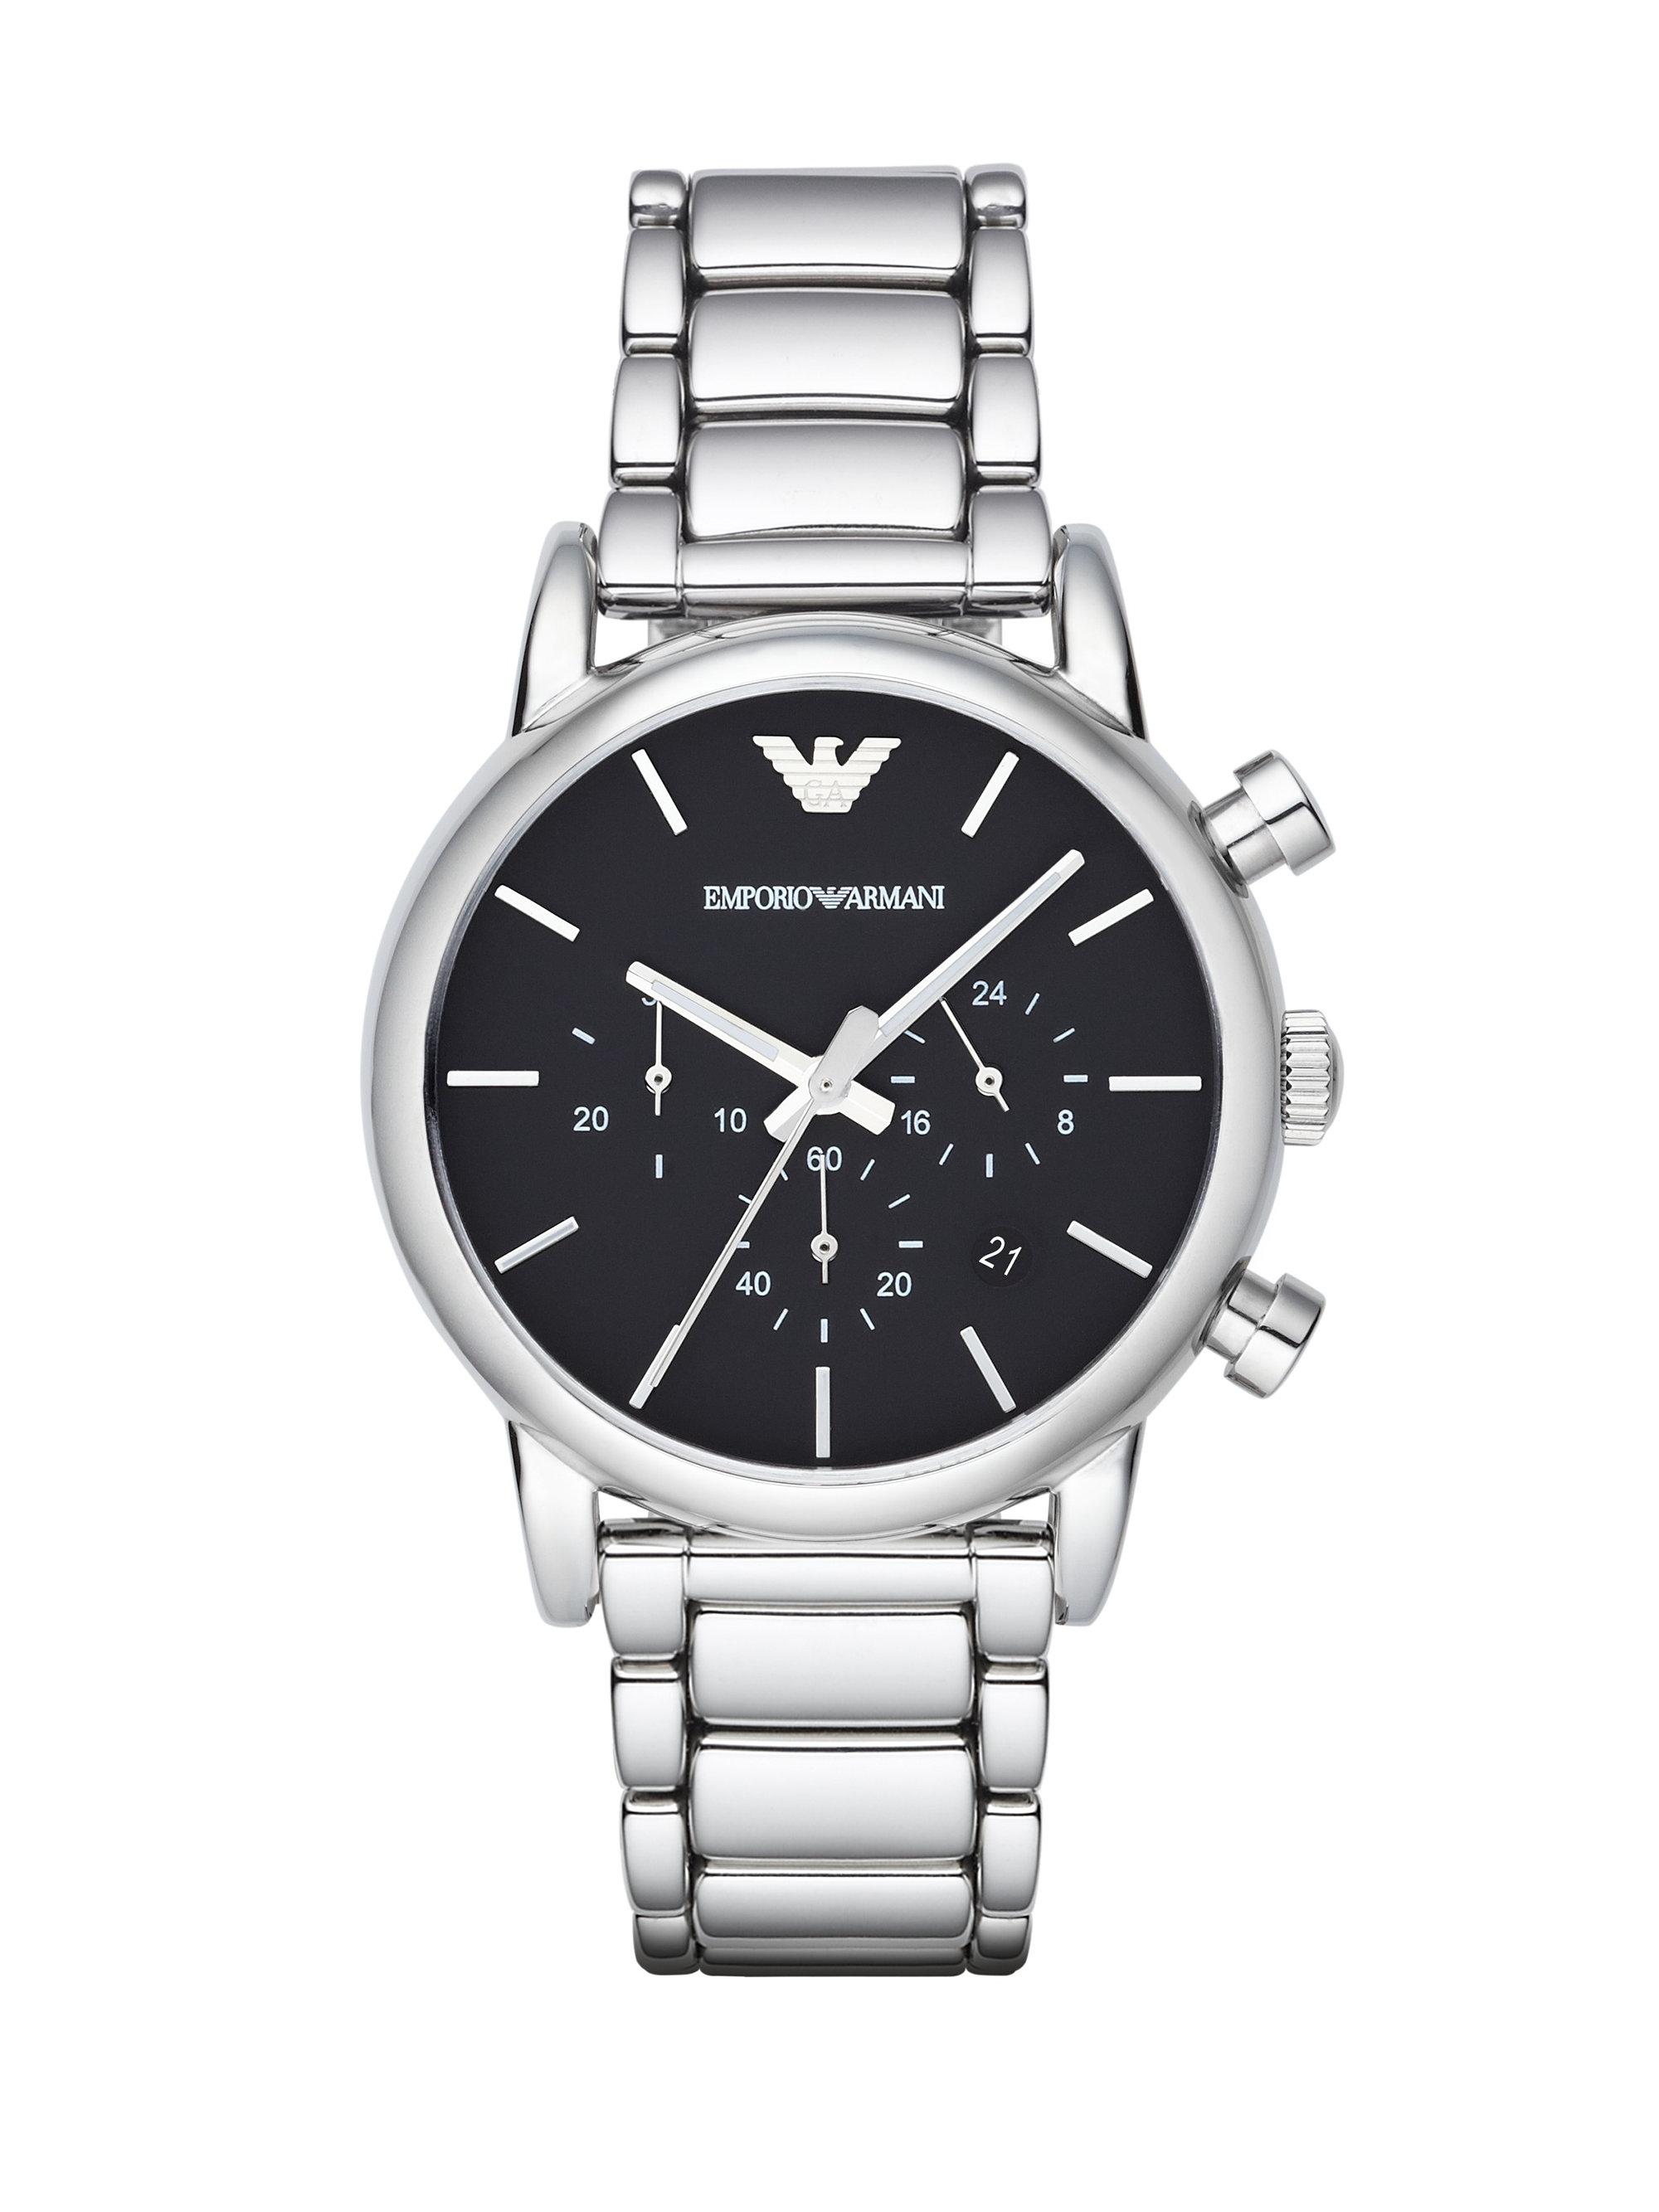 9b344e2bd8d2 Michael Kors Parker Women s White Dial Leather Band Watch .